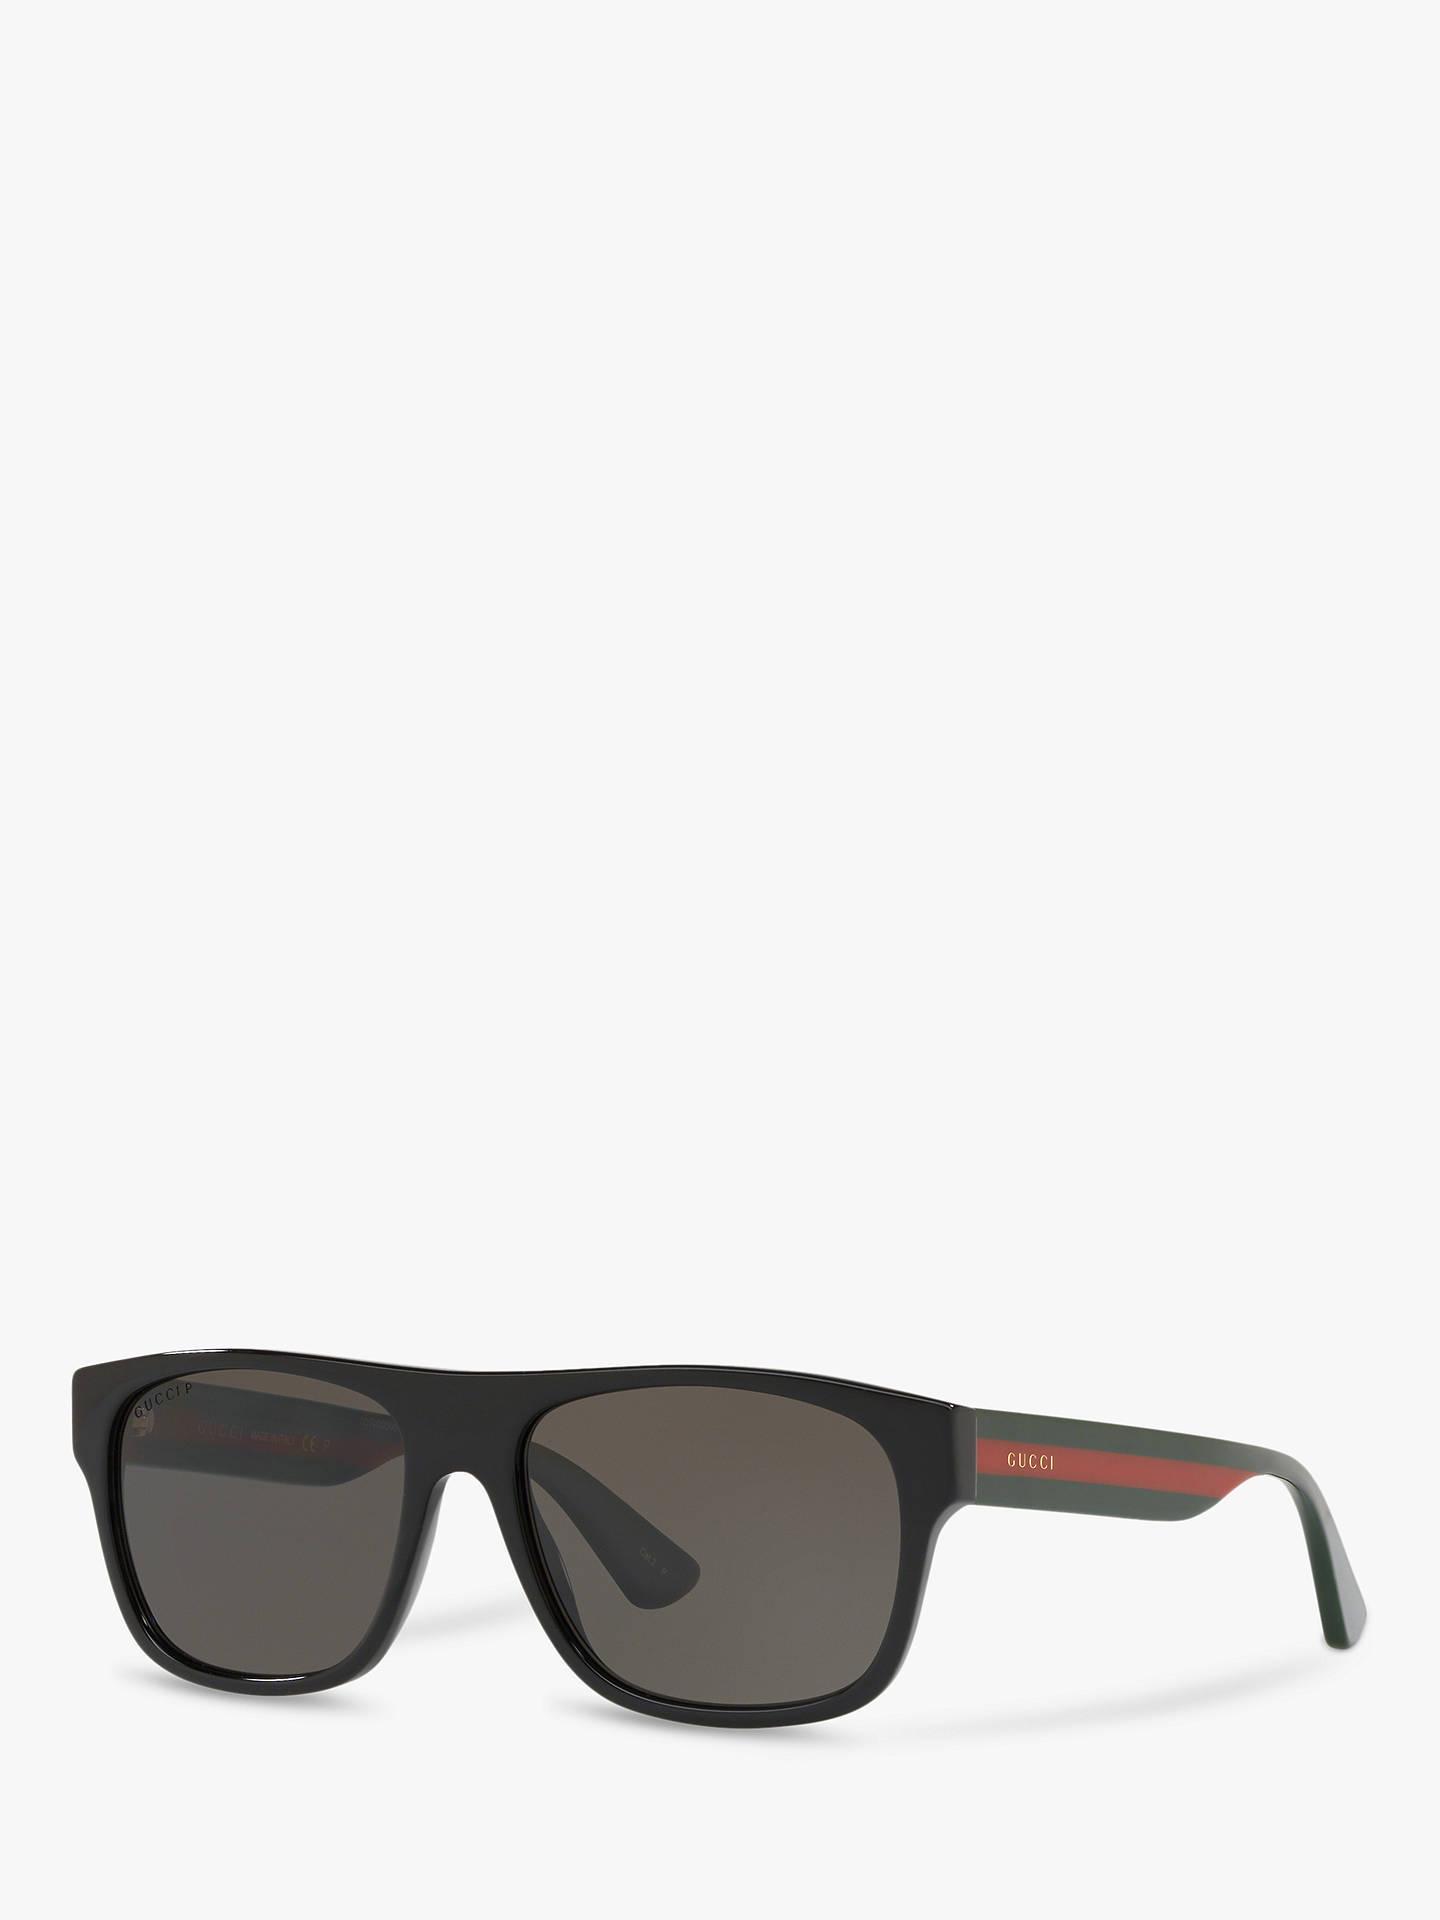 21599b839 Buy Gucci GG0341S Men's Rectangular Sunglasses, Multi/Black Online at  johnlewis. ...